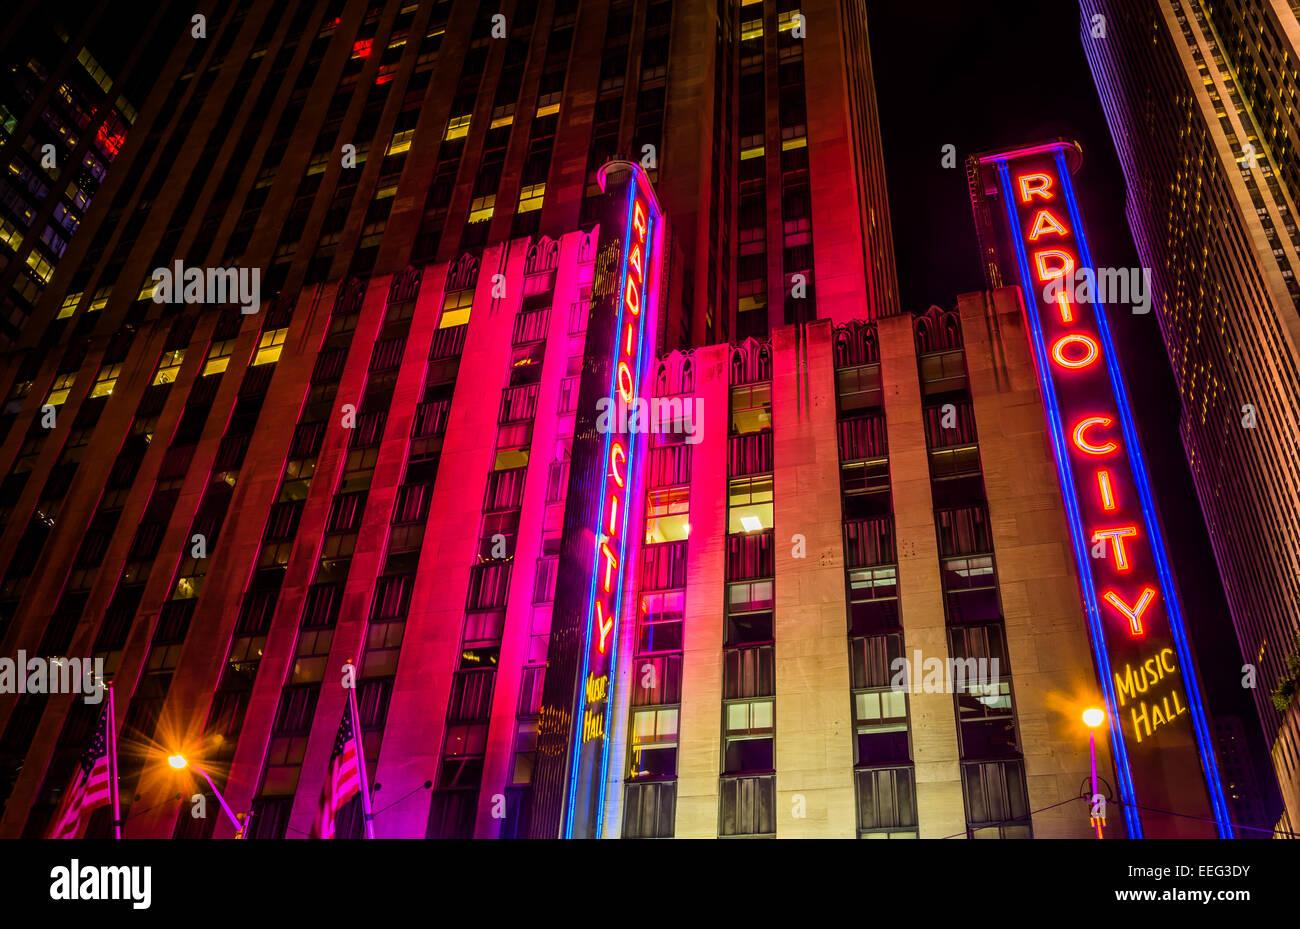 Radio City Music Hall at night, in Rockefeller Center, Manhattan, New York. - Stock Image